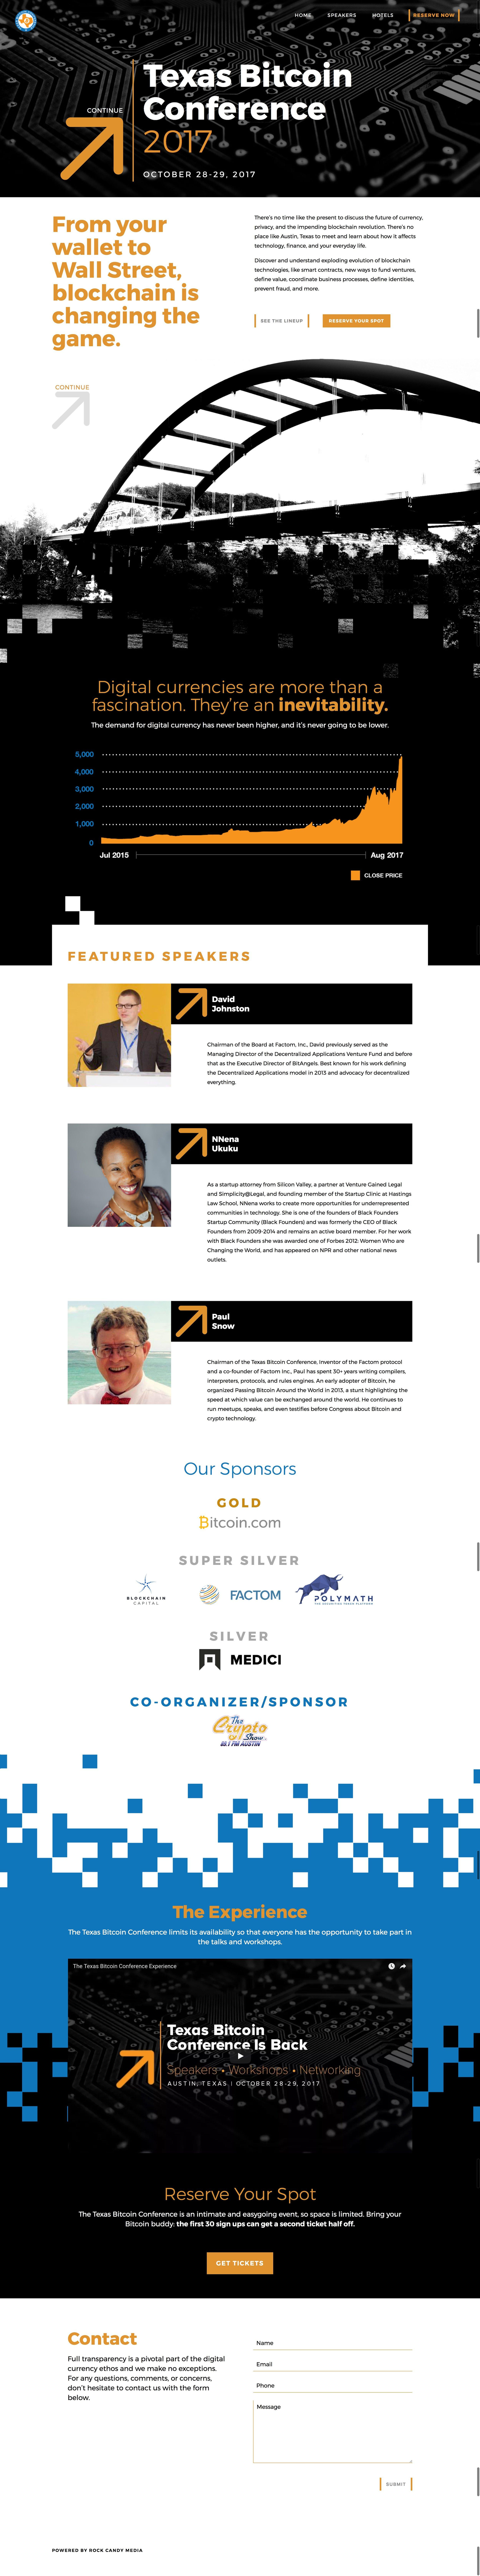 Texas Bitcoin Conference Homepage.jpg